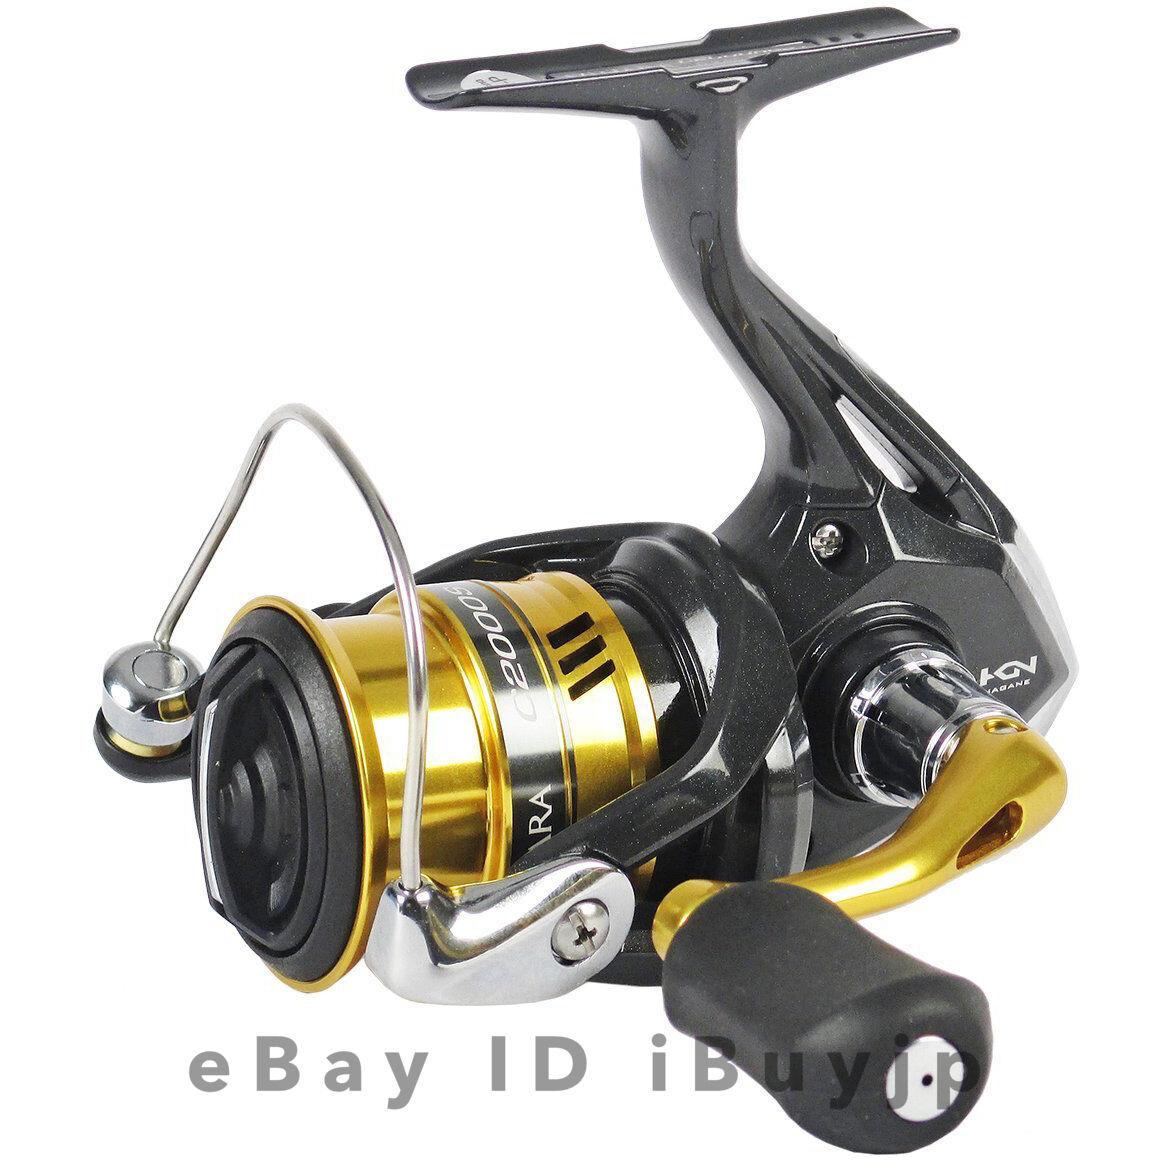 673efde6cd88 Shimano Fishing Reel 17 Sahara C2000hgs for sale online